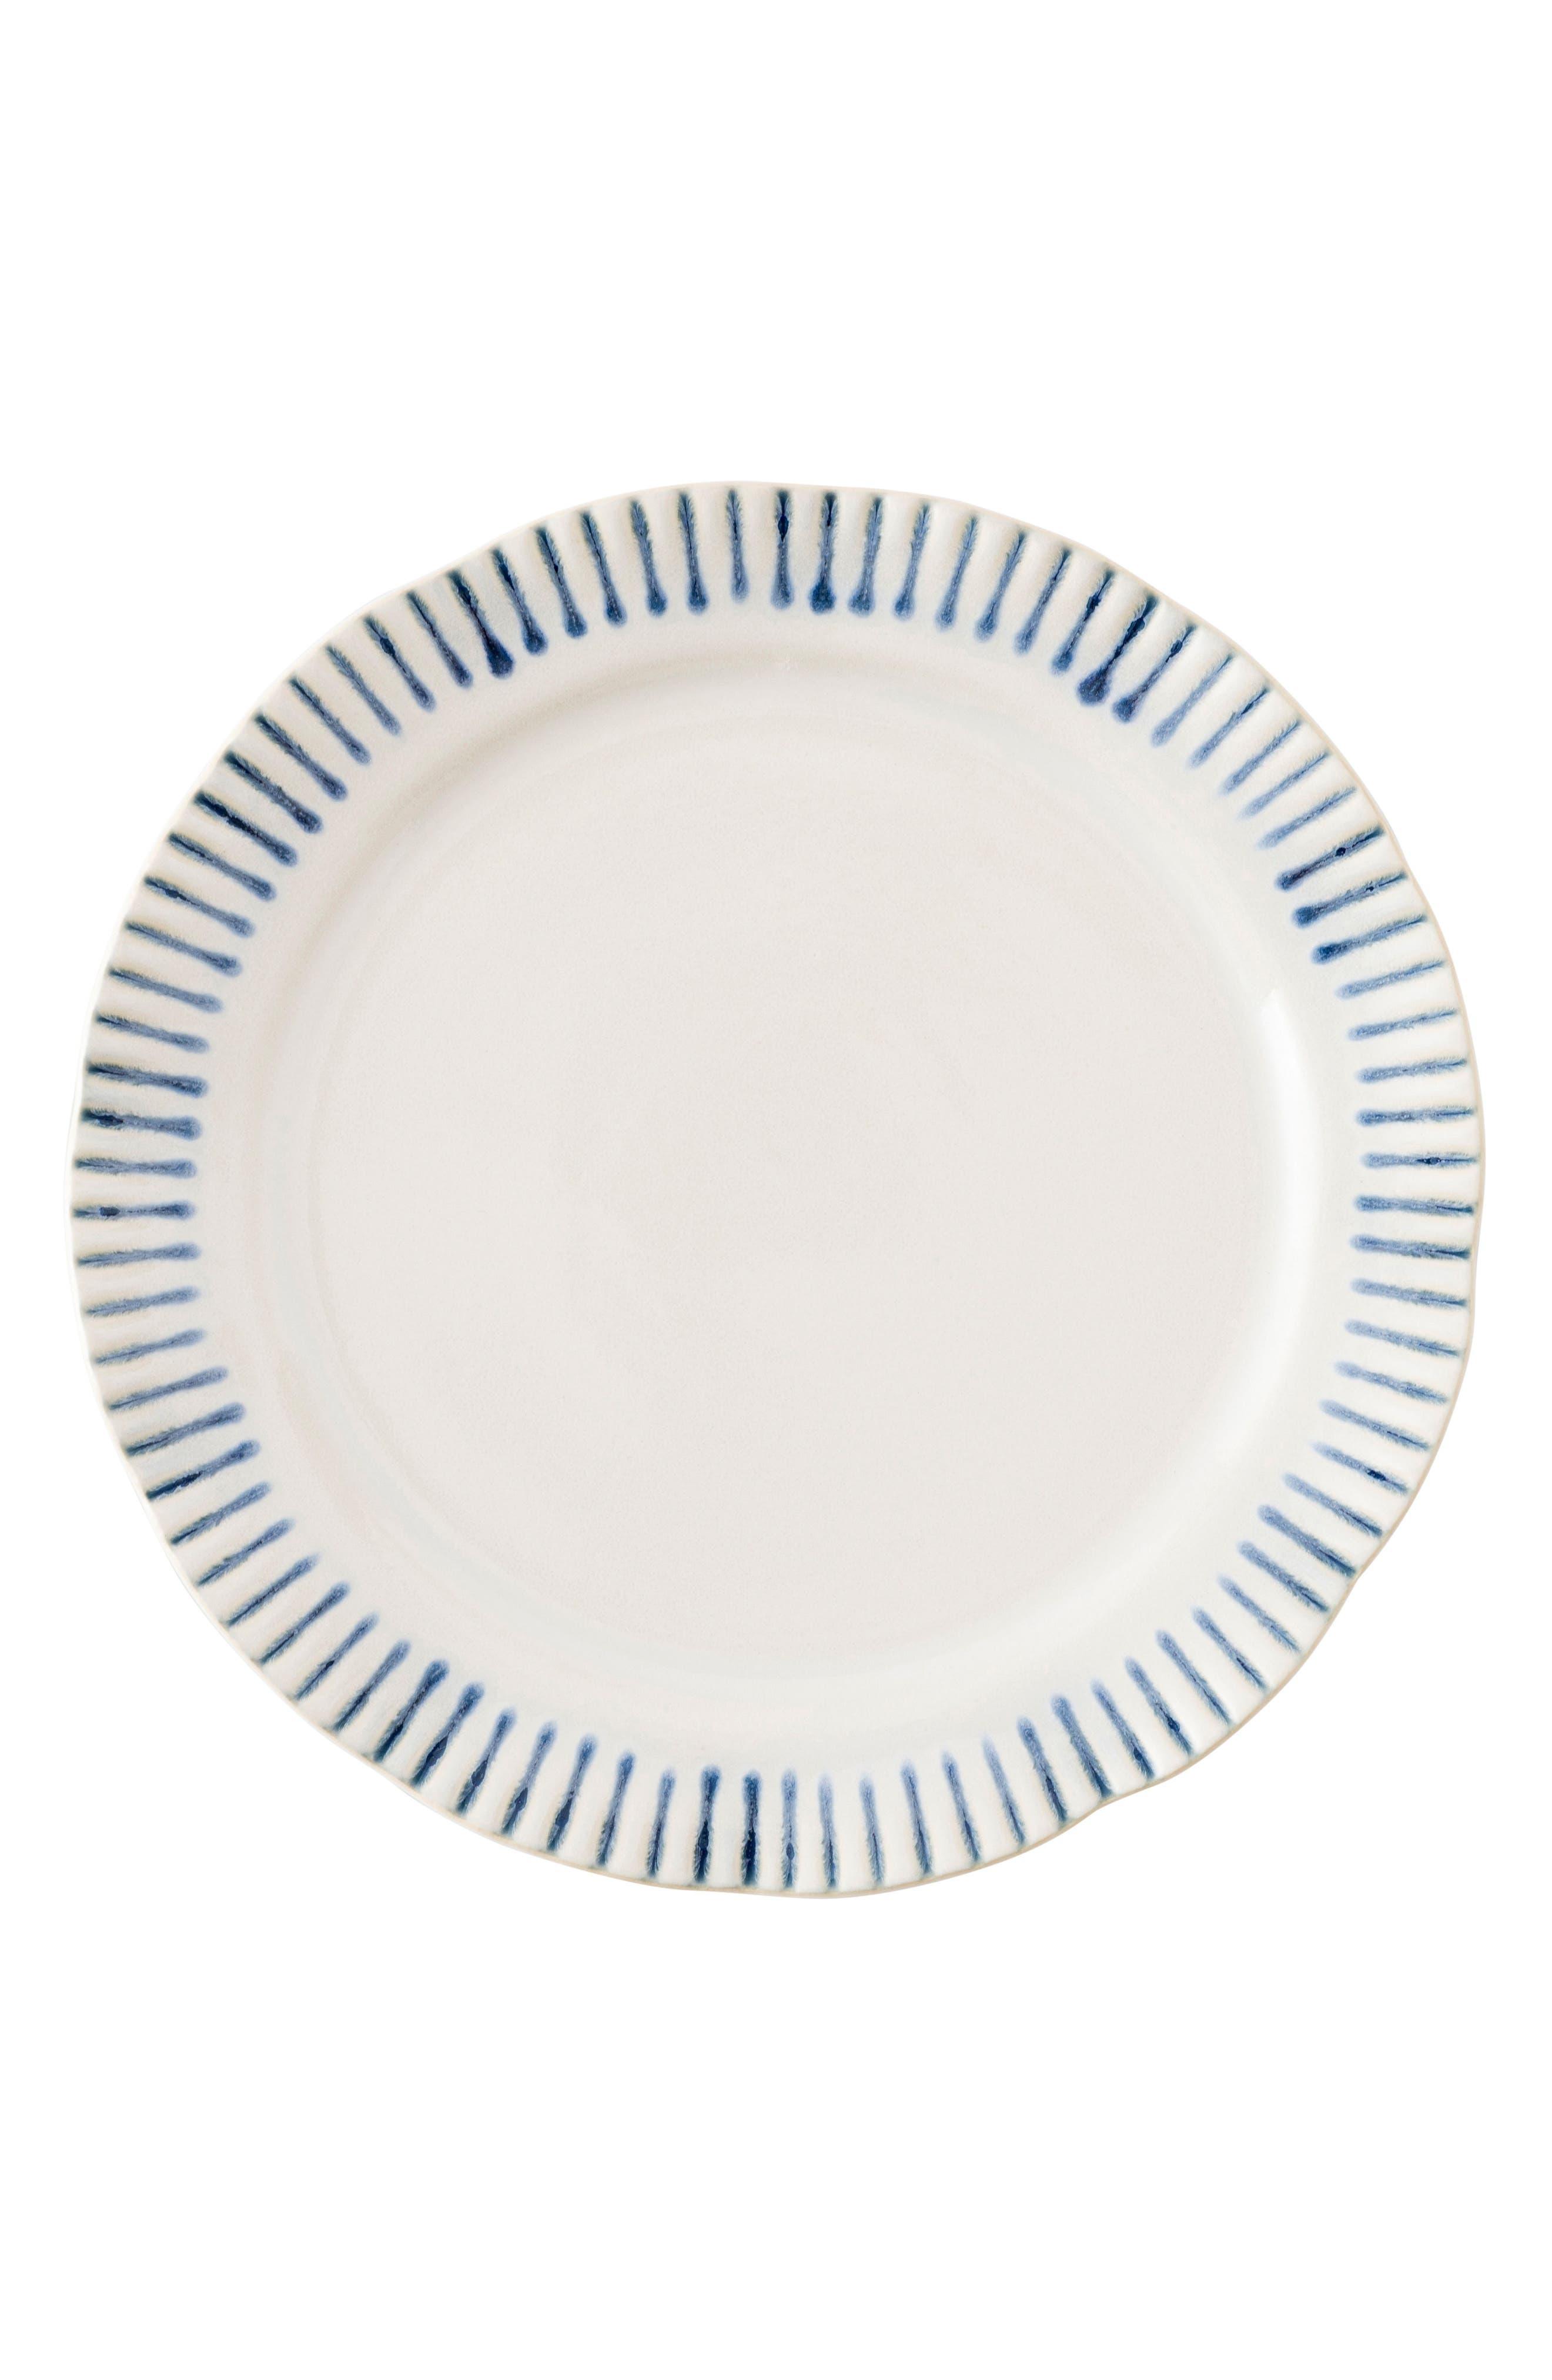 Juliska Sitio Stripe Stoneware Salad Plate